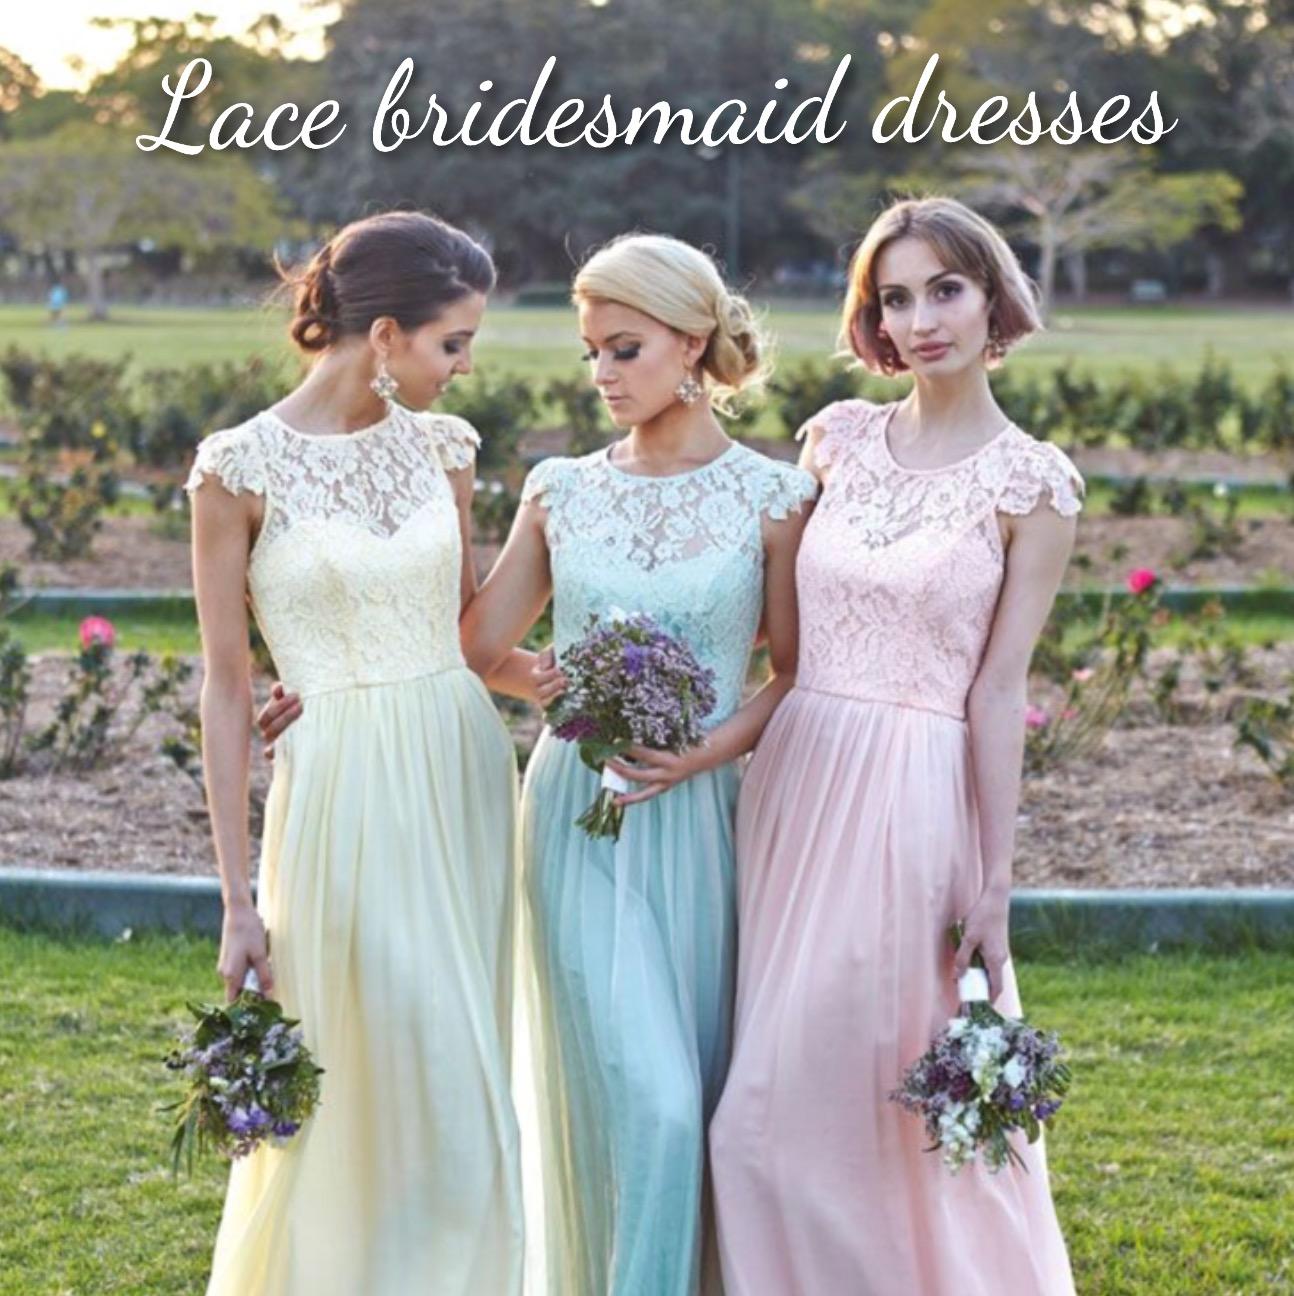 Trend alert lace bridesmaids dresses pearls and lace wedding lace bridesmaids dresses pearls and lace wedding dresses ireland ombrellifo Image collections